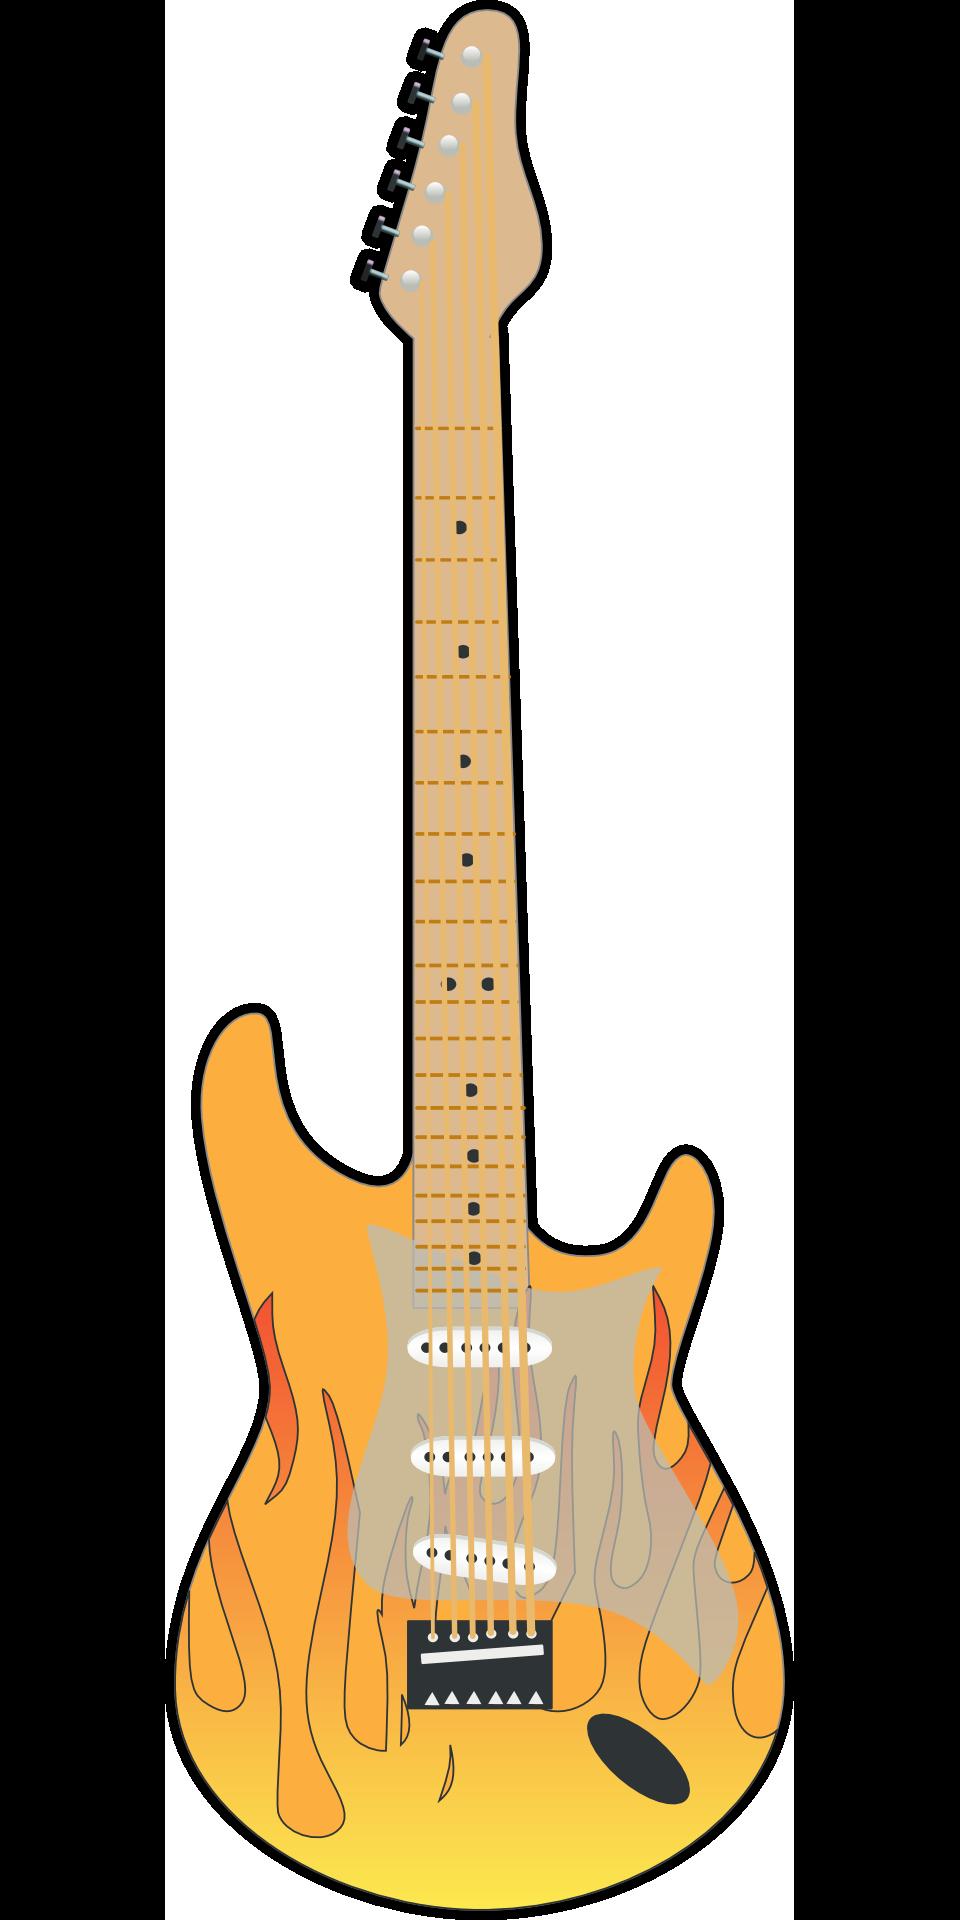 Rock Guitar Yellow Brown Musical Instrument Drawing